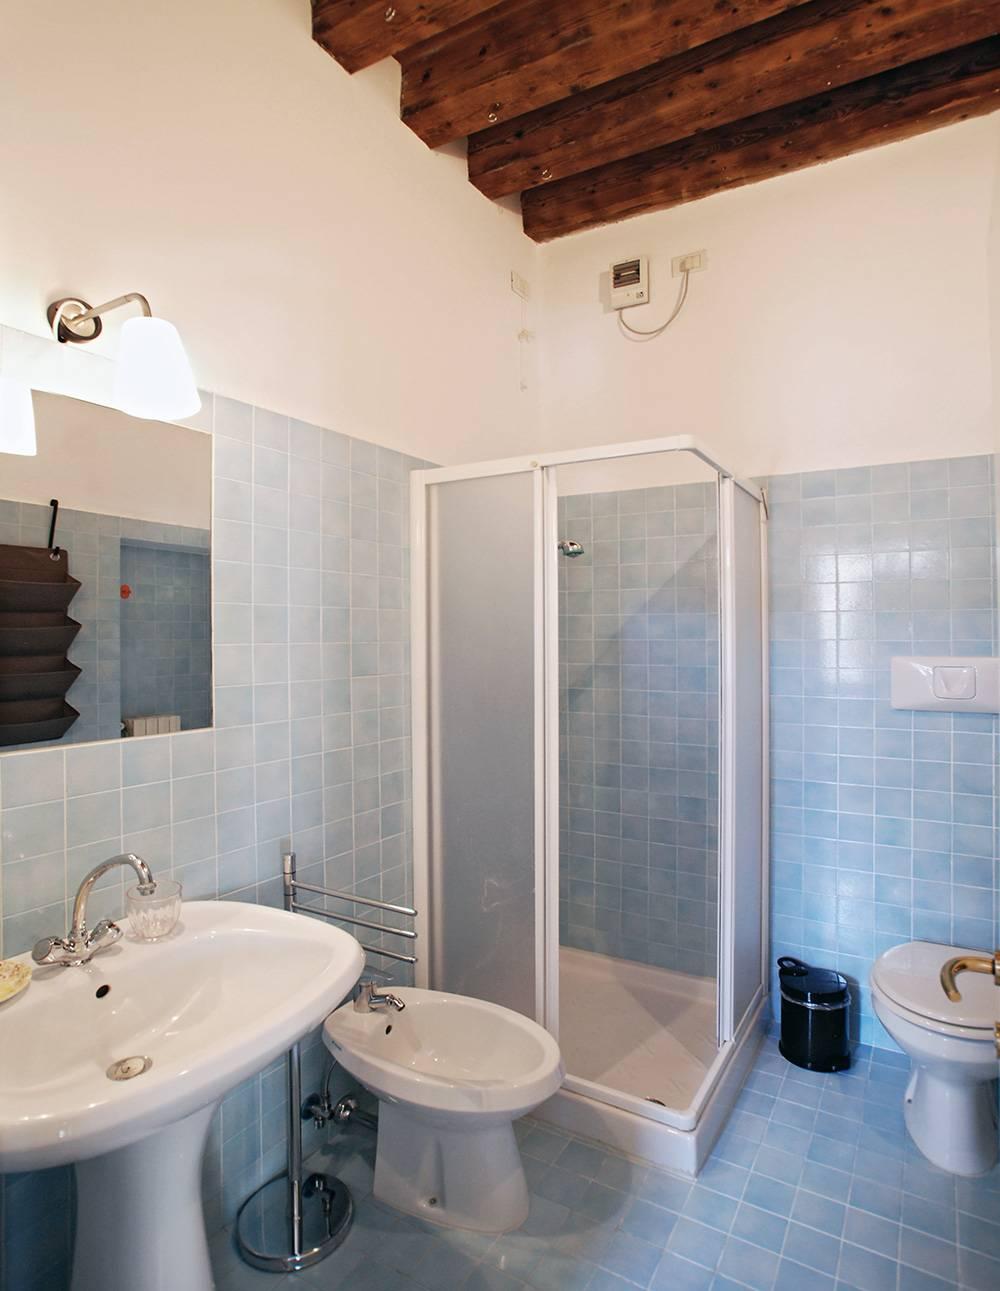 en-suite bathroom with shower